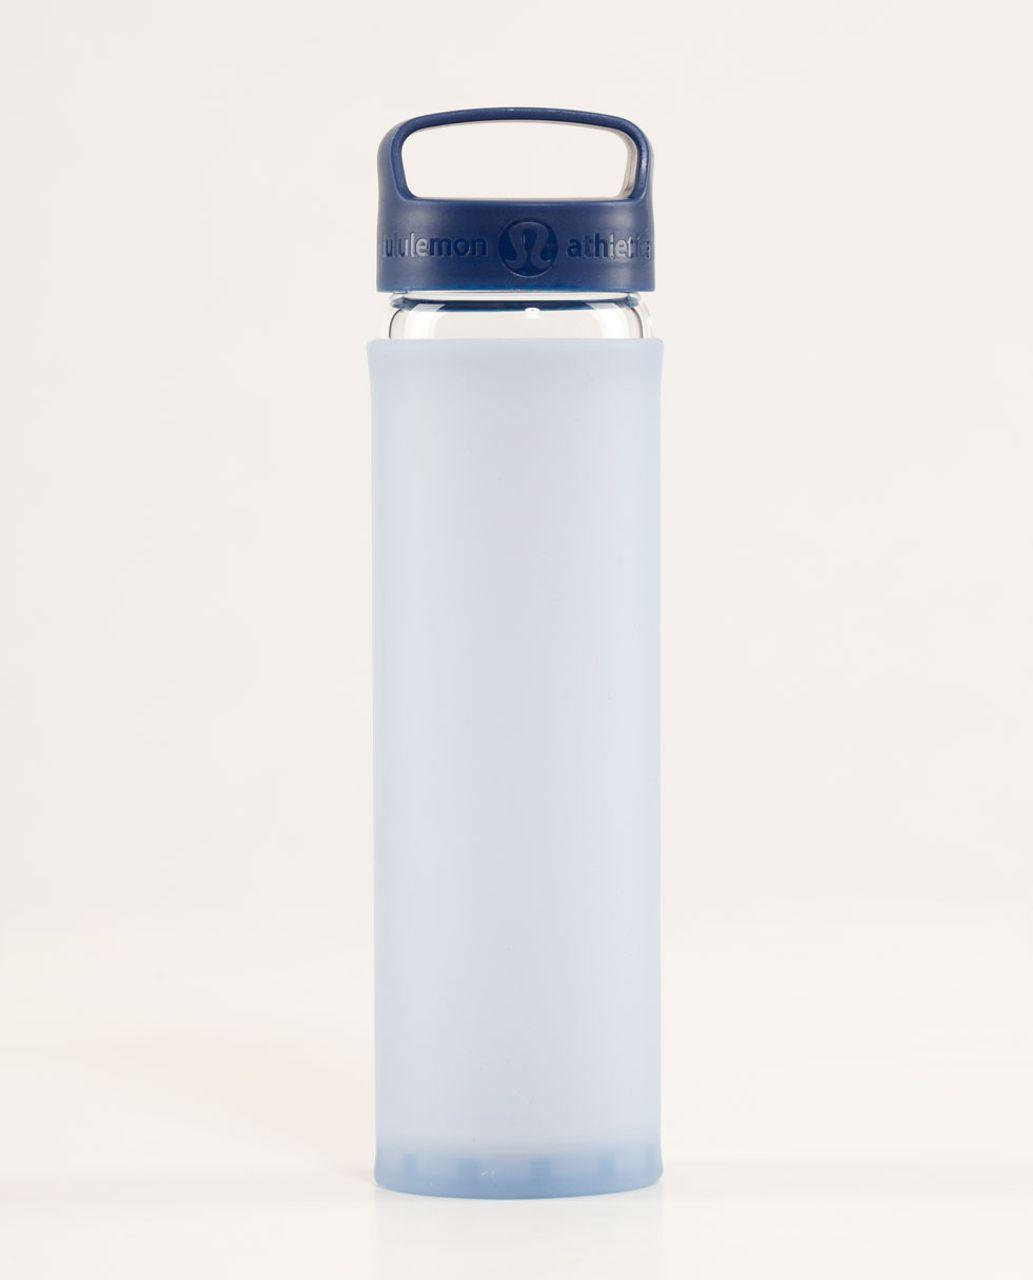 Lululemon Pure Balance Water Bottle - Moonglow / Hampton Blue